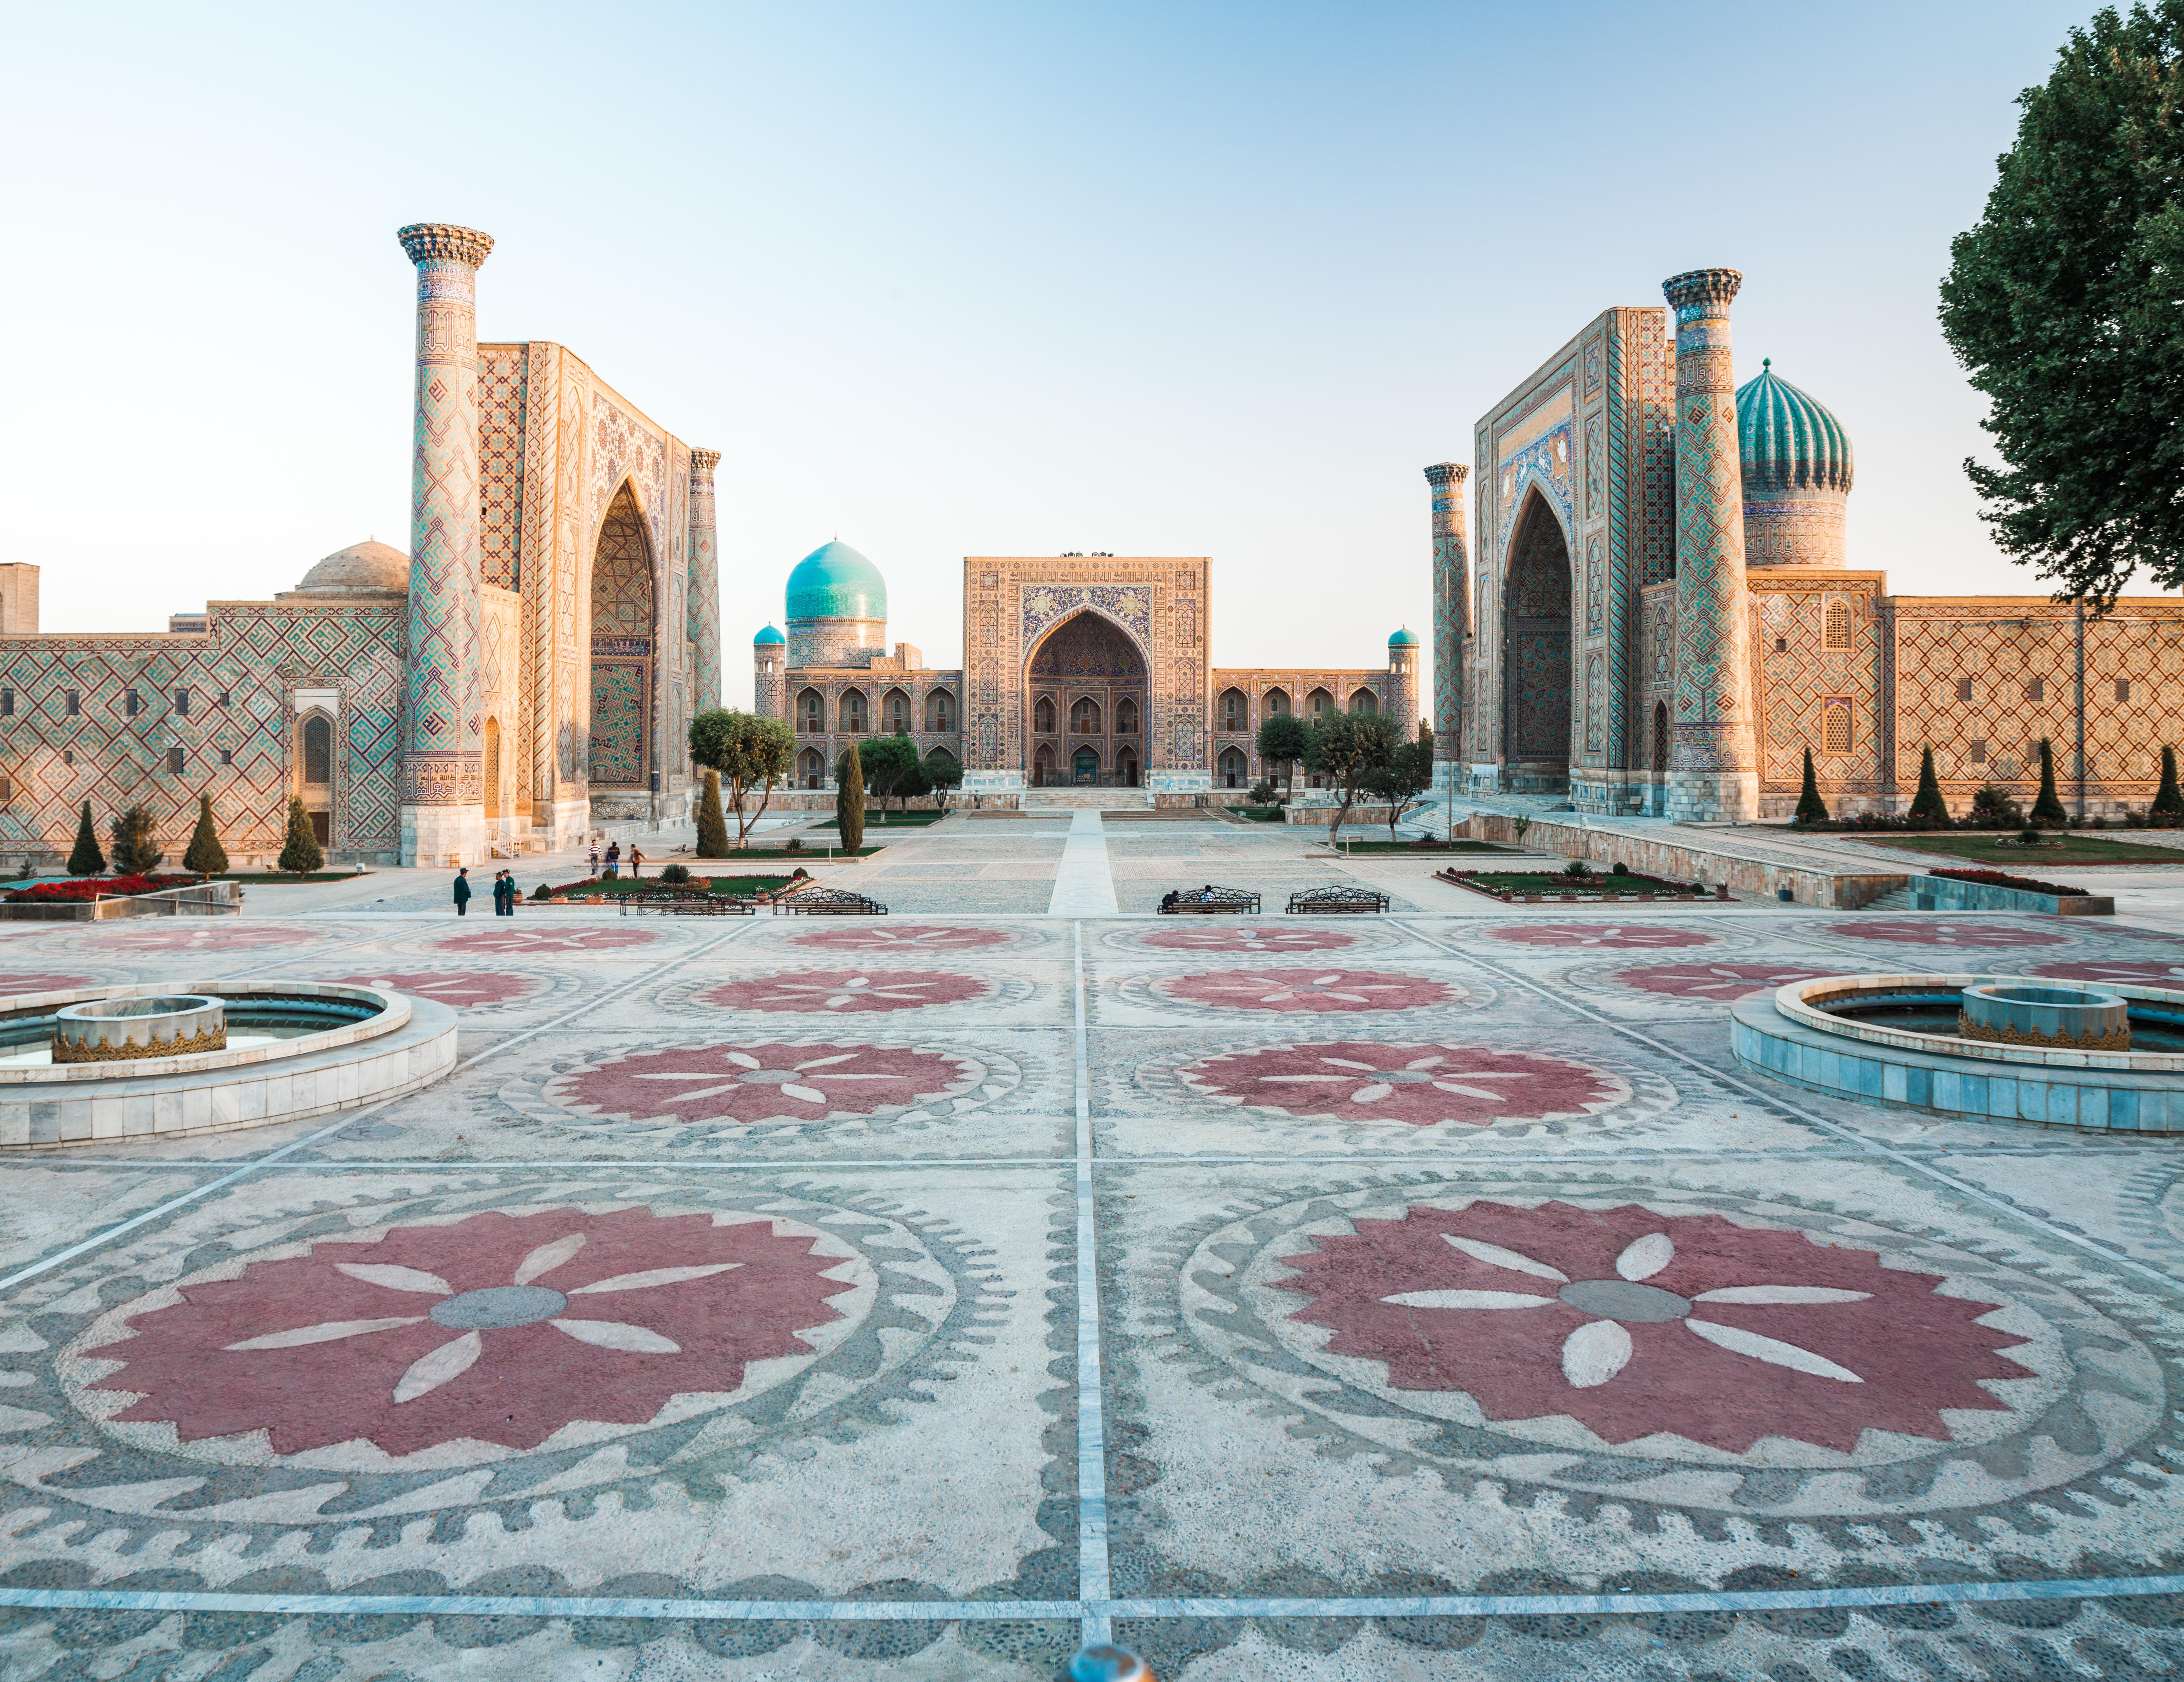 Déjate seducir por el encanto oriental de la Plaza Registan - Uzbekistán Circuito La Ruta de Samarcanda